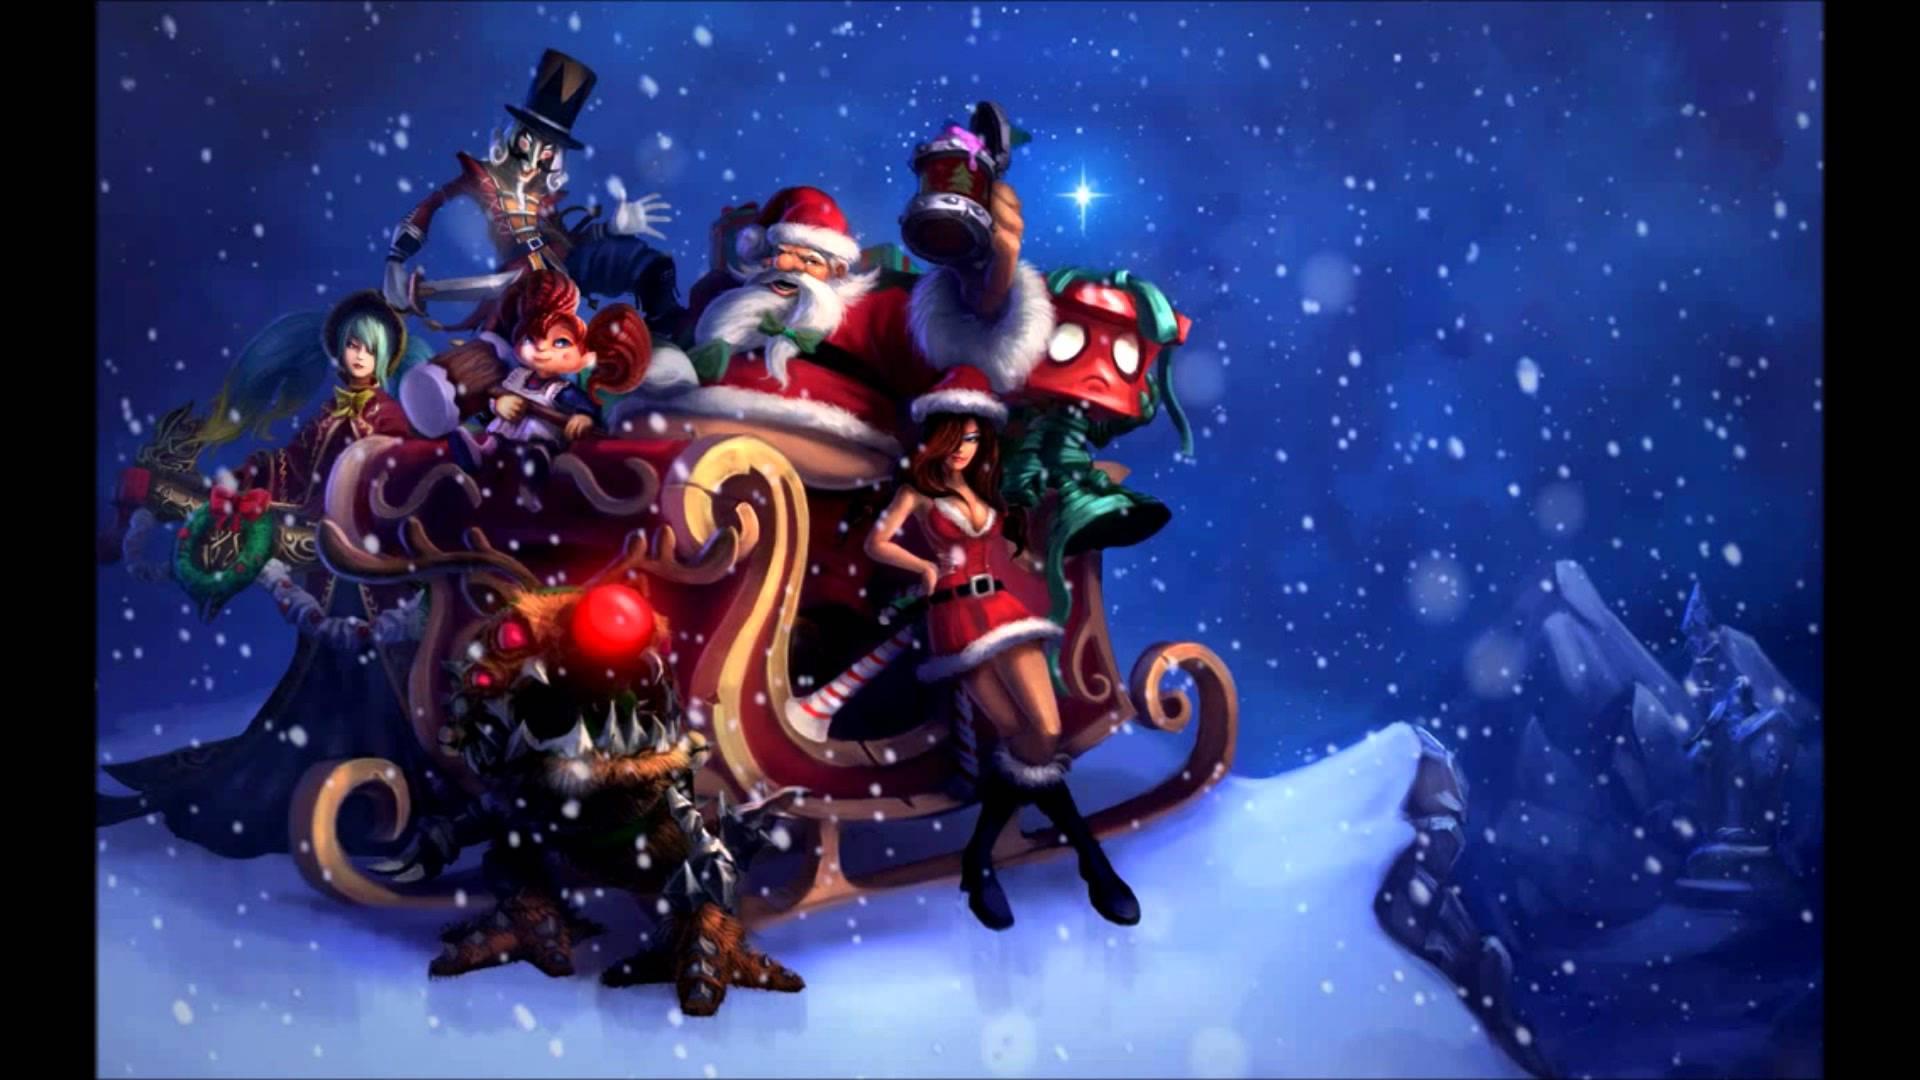 of Legends Christmas Wallpaper